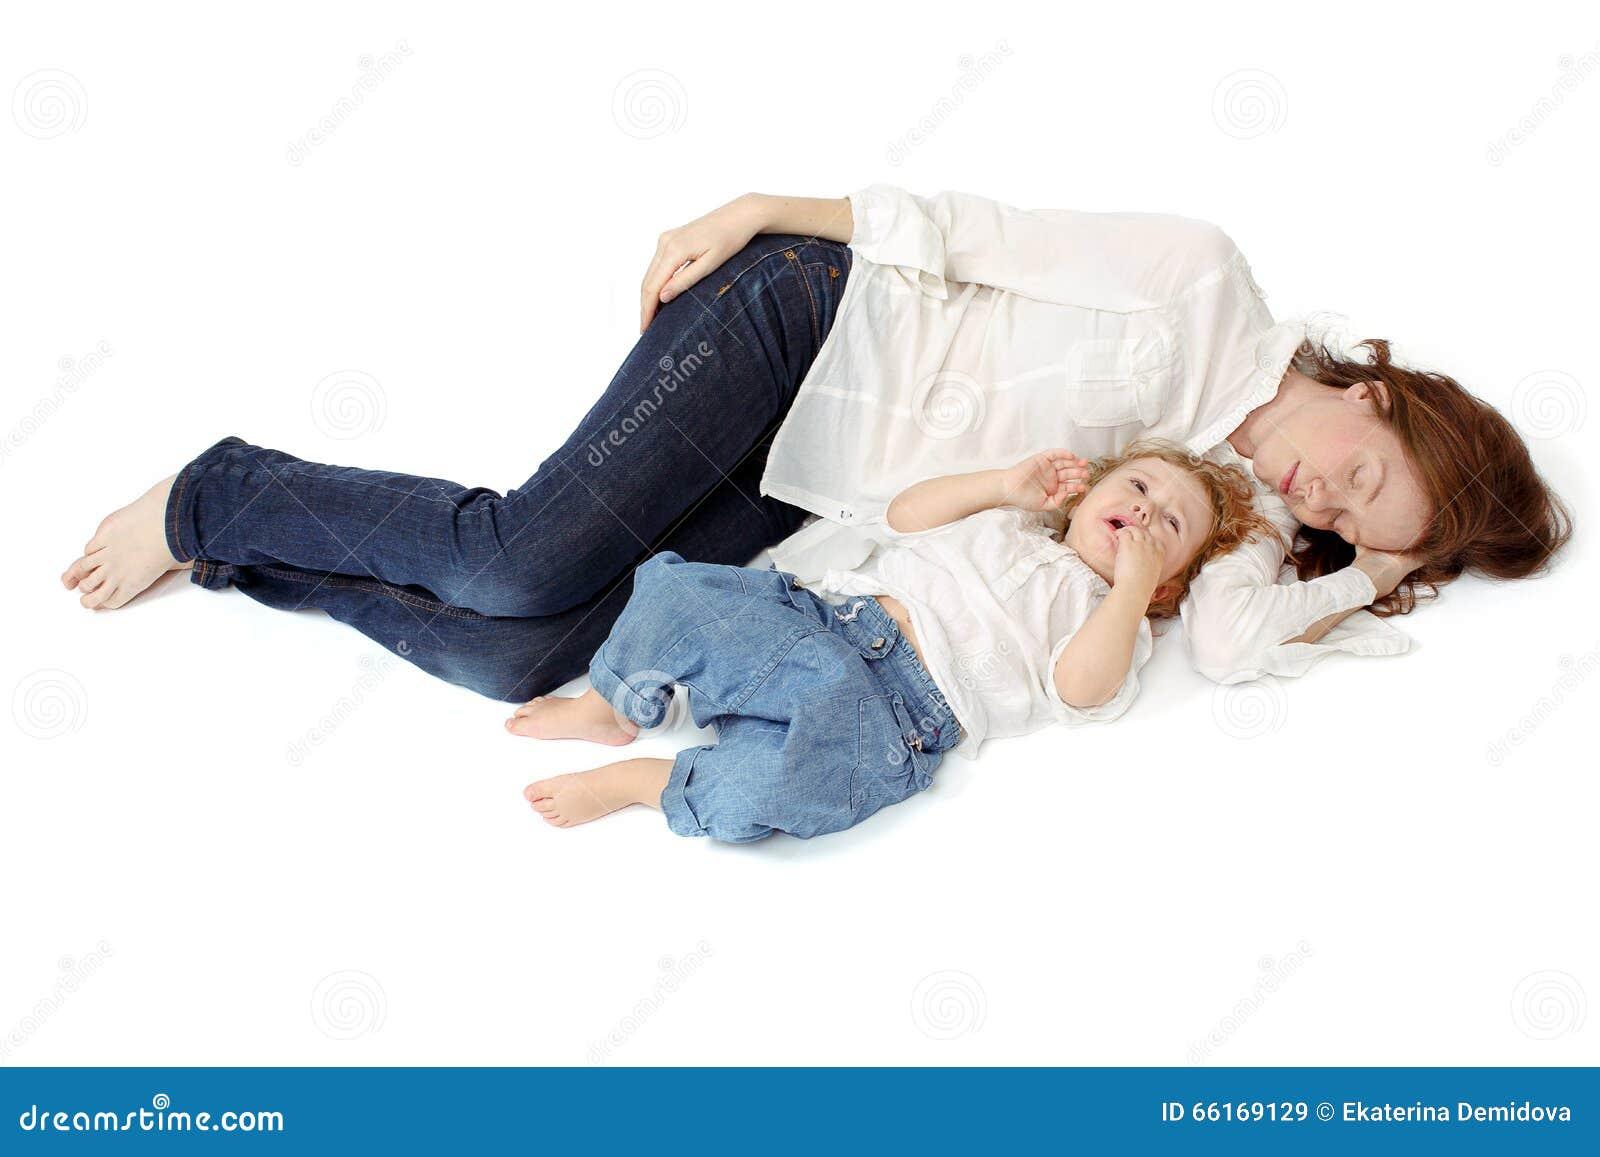 Mom sleeping with her awake child